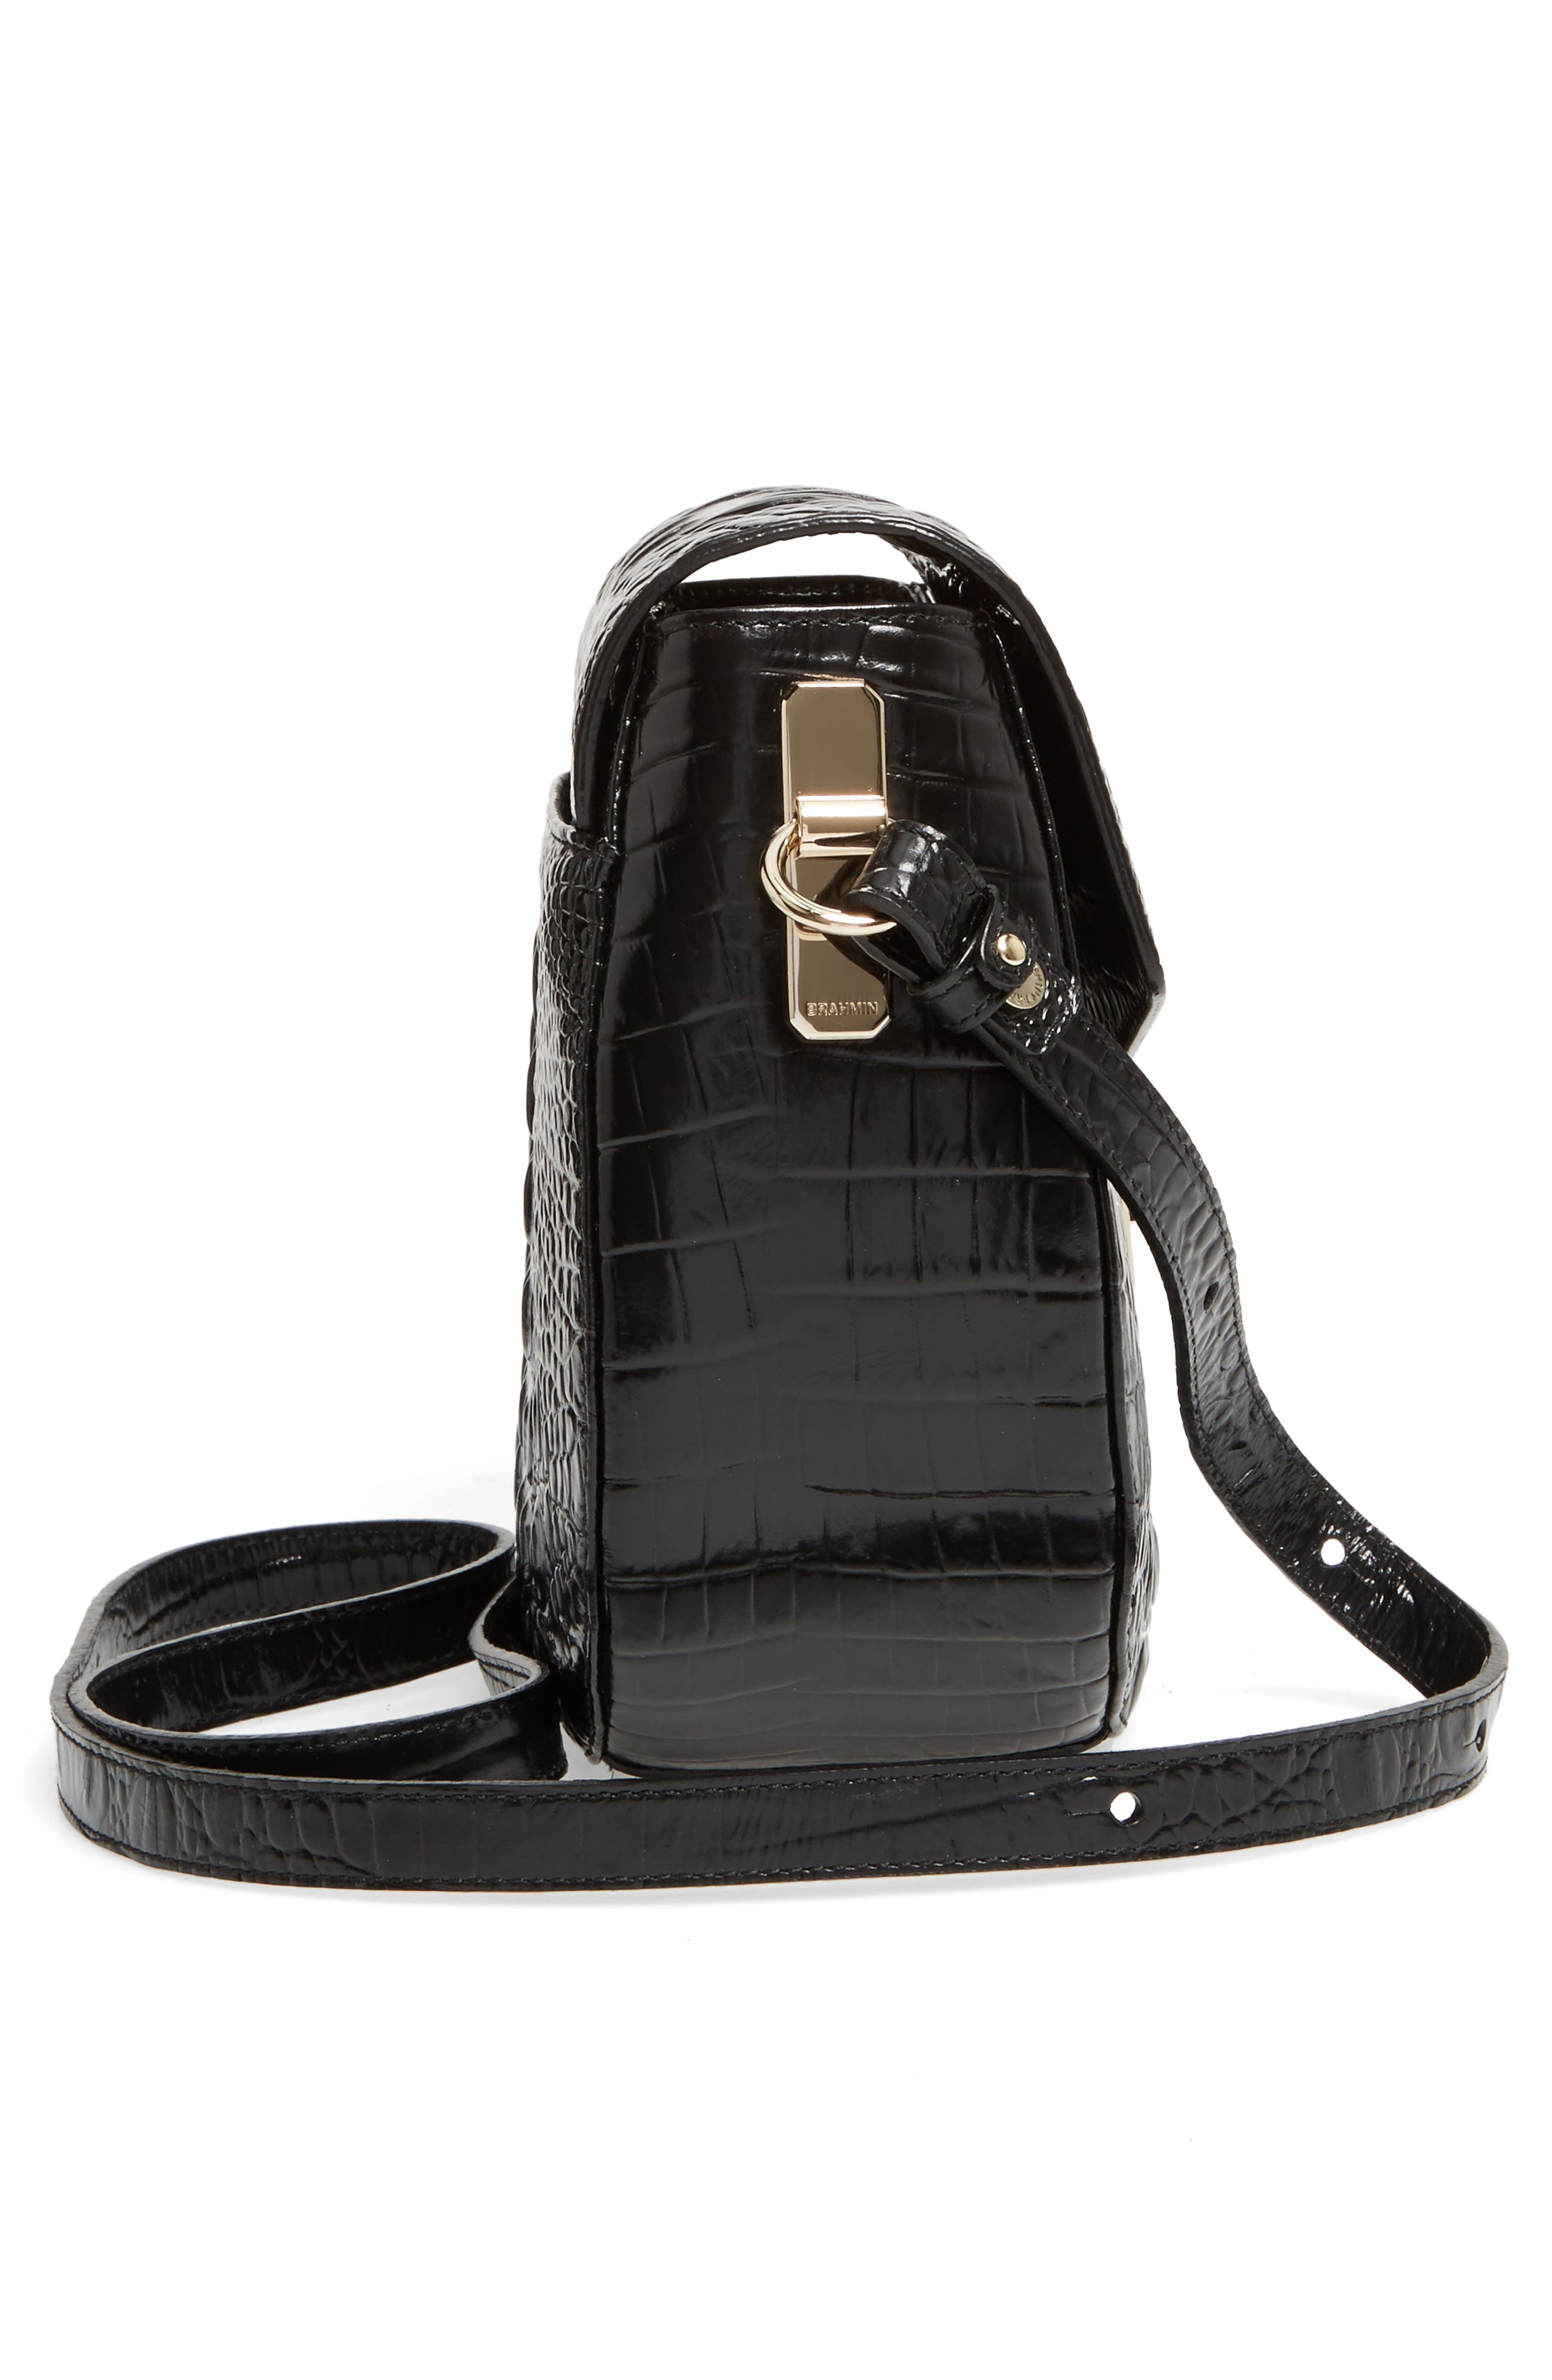 Melbourne - Lizzie Leather Crossbody Bag,                             Alternate thumbnail 21, color,